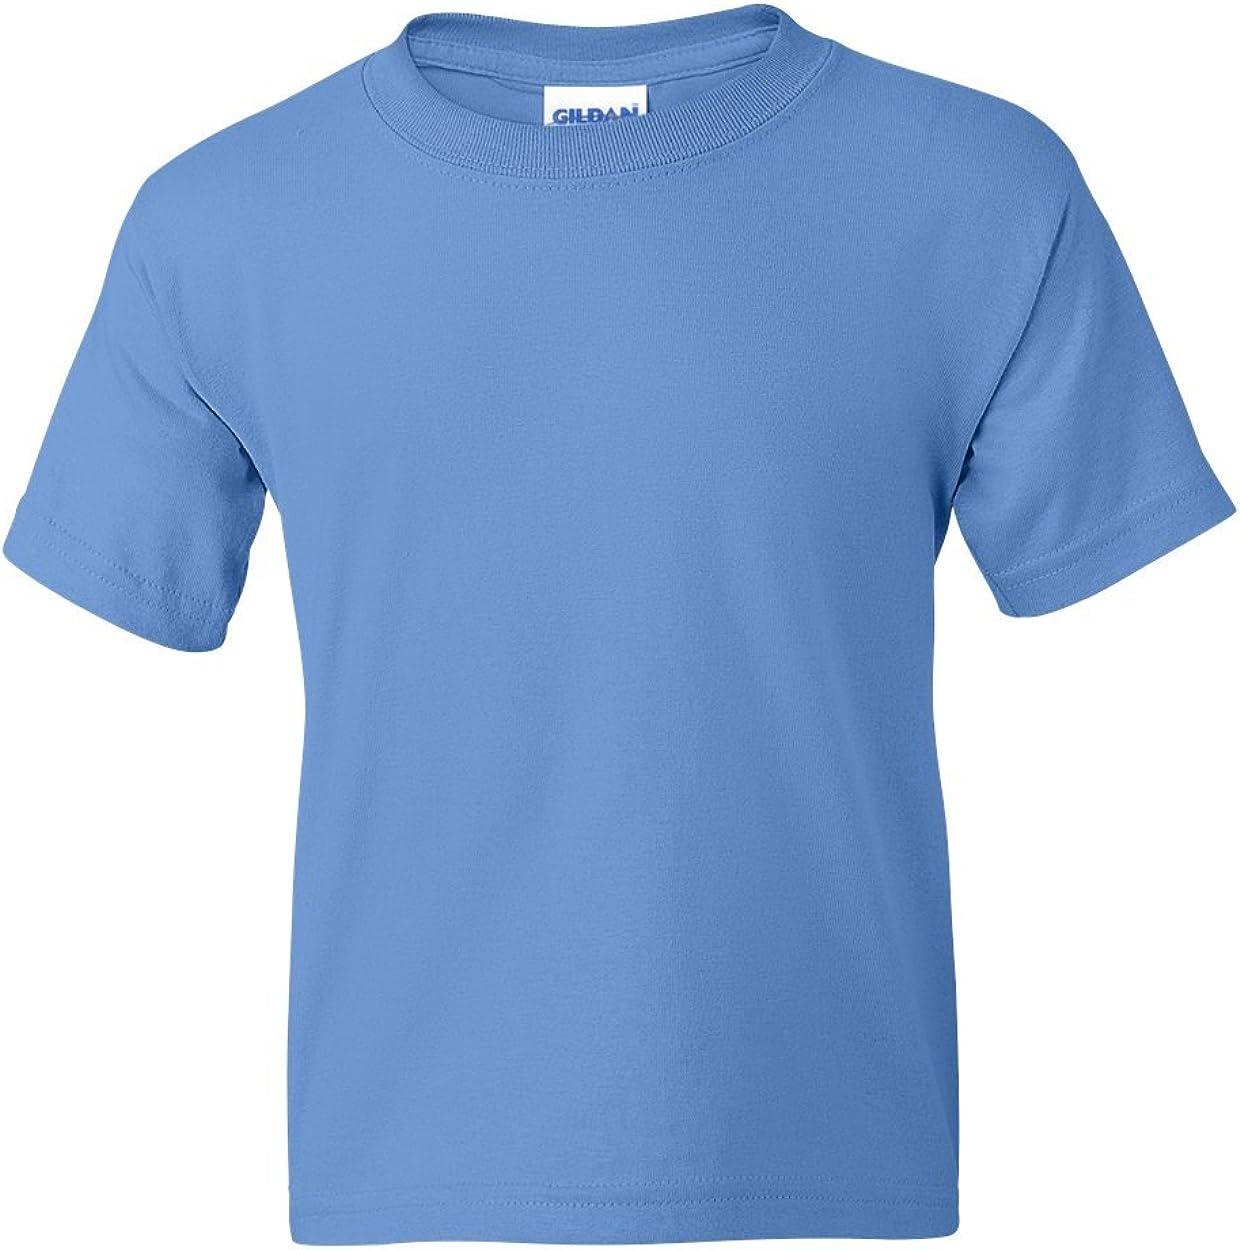 5.5 oz, 50/50 T-Shirt (G800B) Carolina Blue, M (Pack of 12)